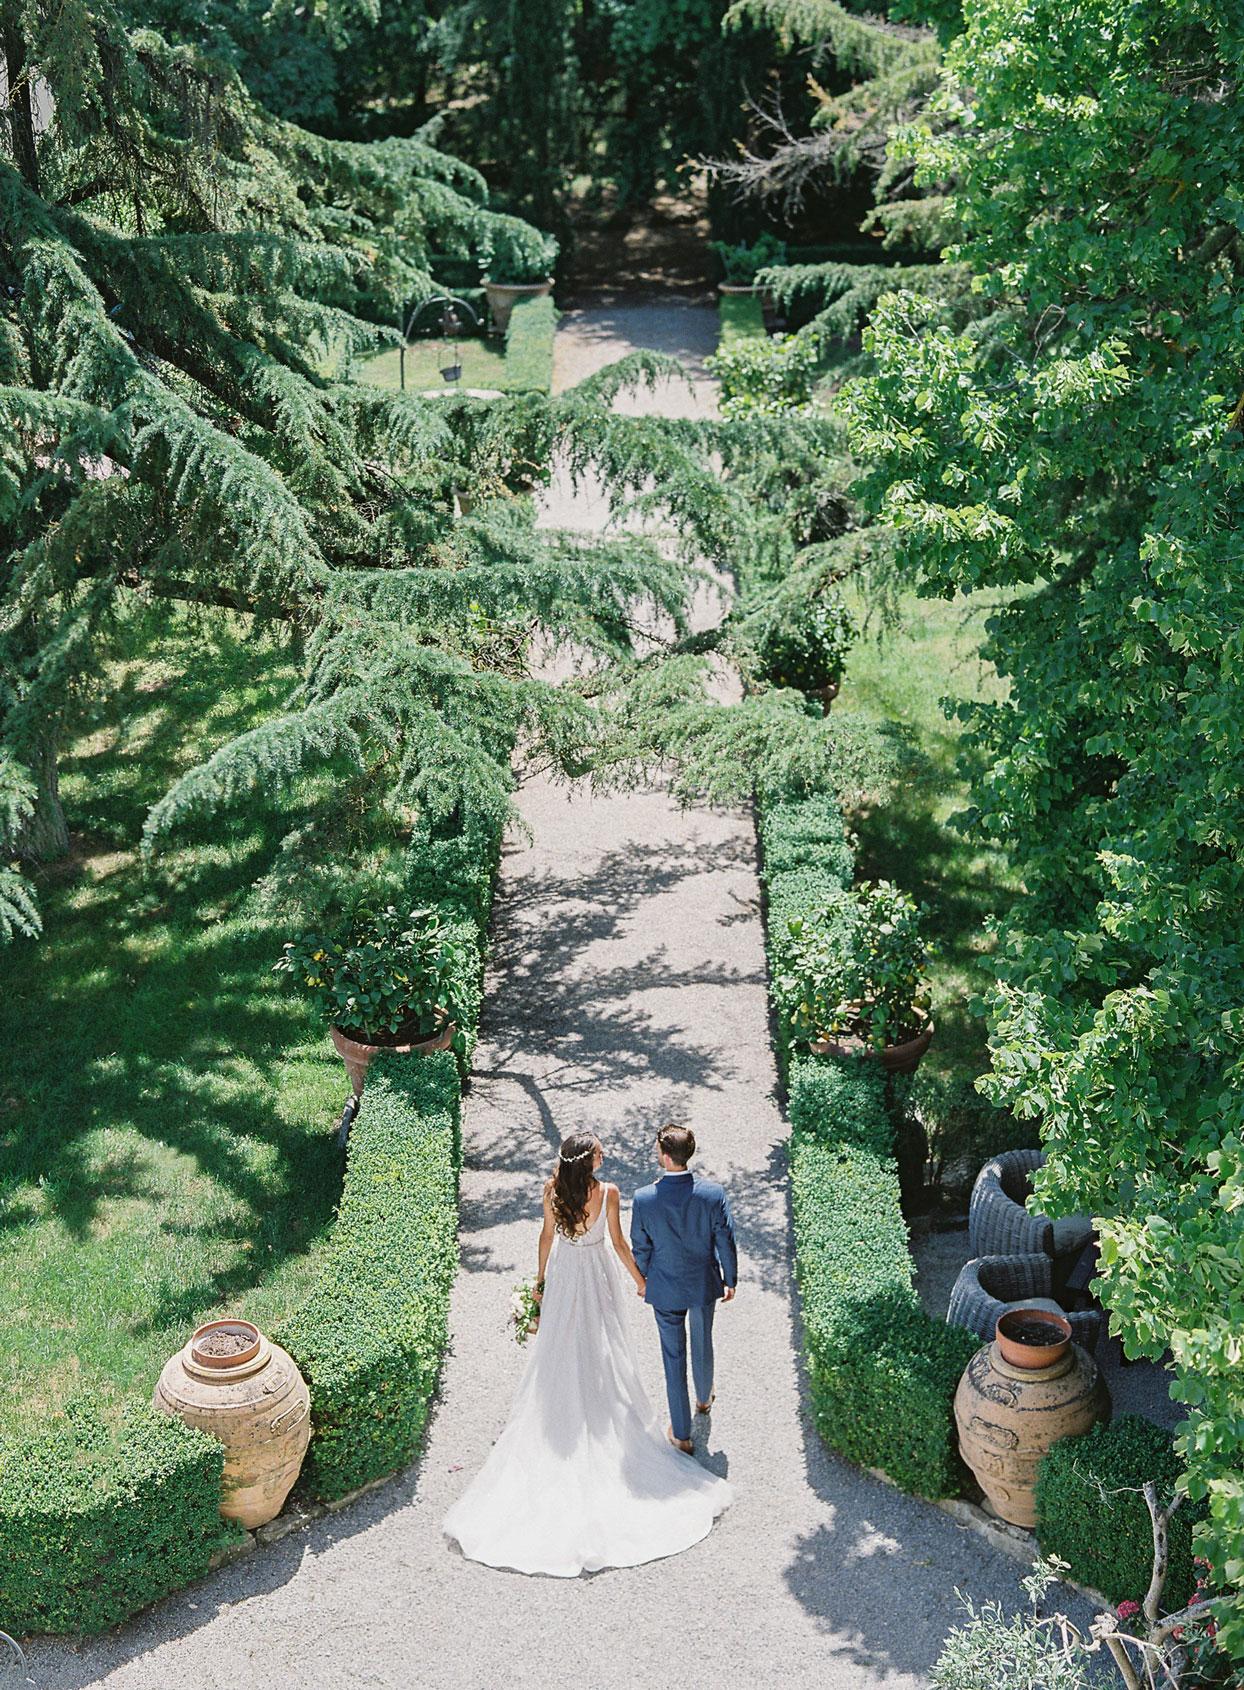 aeiral view of wedding couple outdoor garden pathway